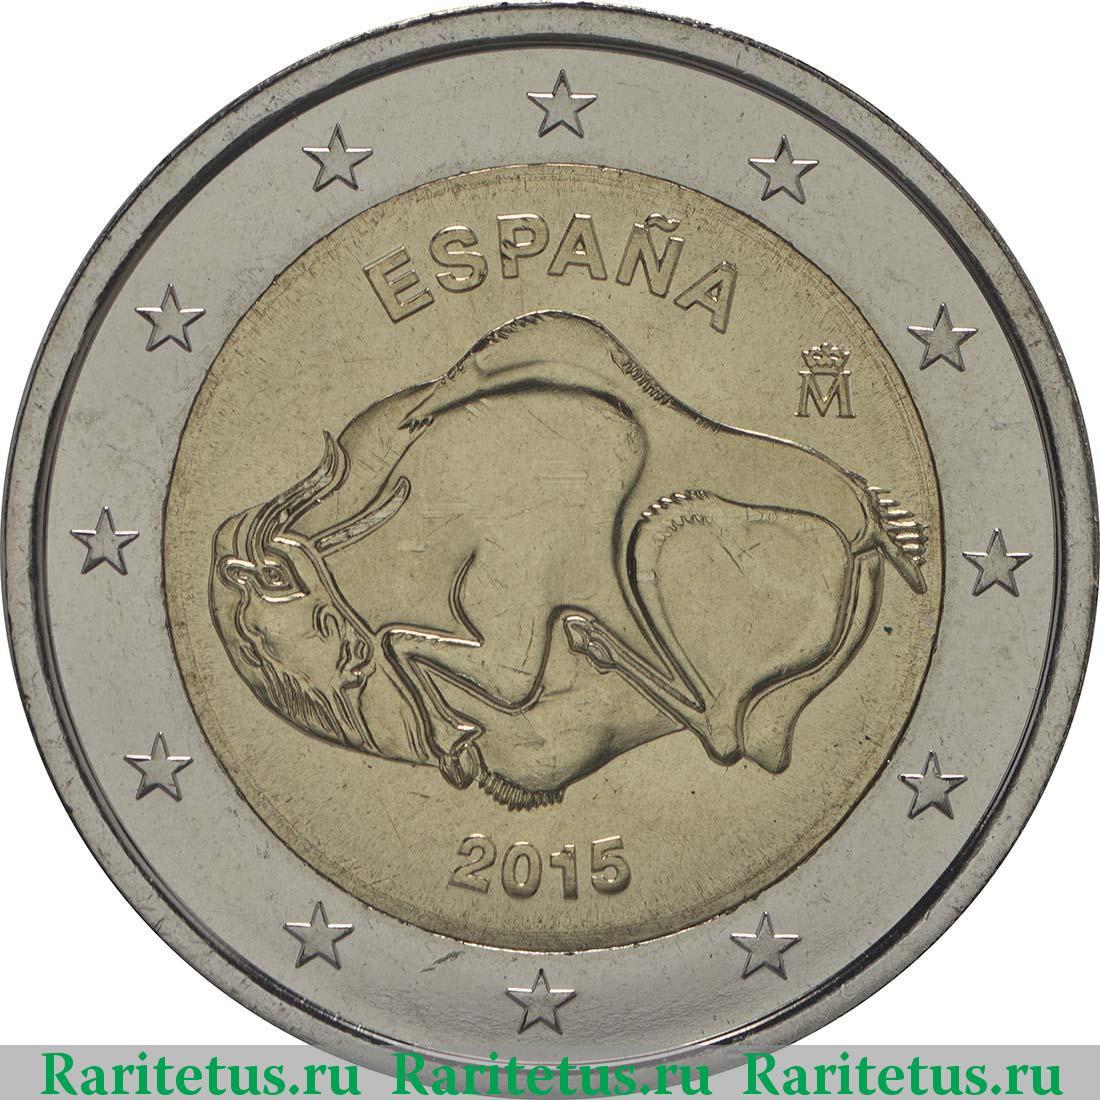 Памятная монета год россии в испании 2011 10 евро сирия монеты